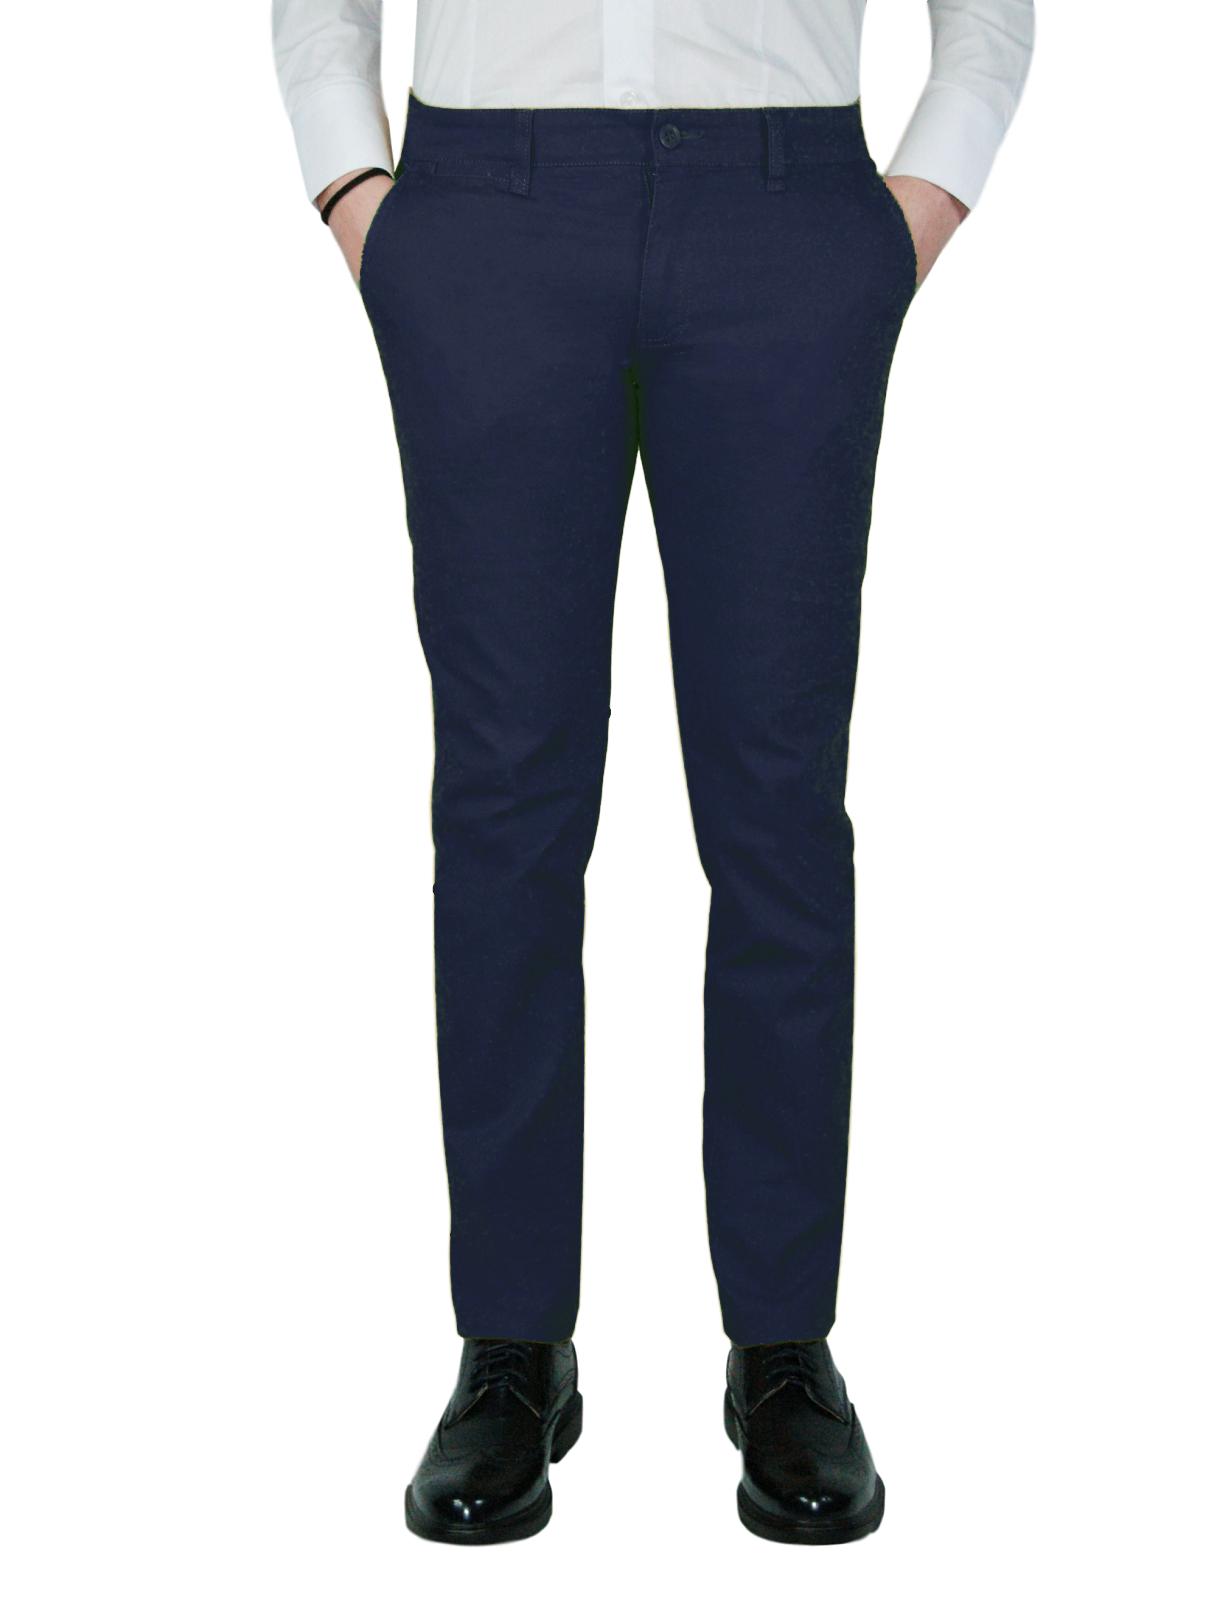 Pantalone-Uomo-Chino-Primaverile-slim-fit-Pantaloni-Eleganti-Blu-Verde-Nero miniatura 16